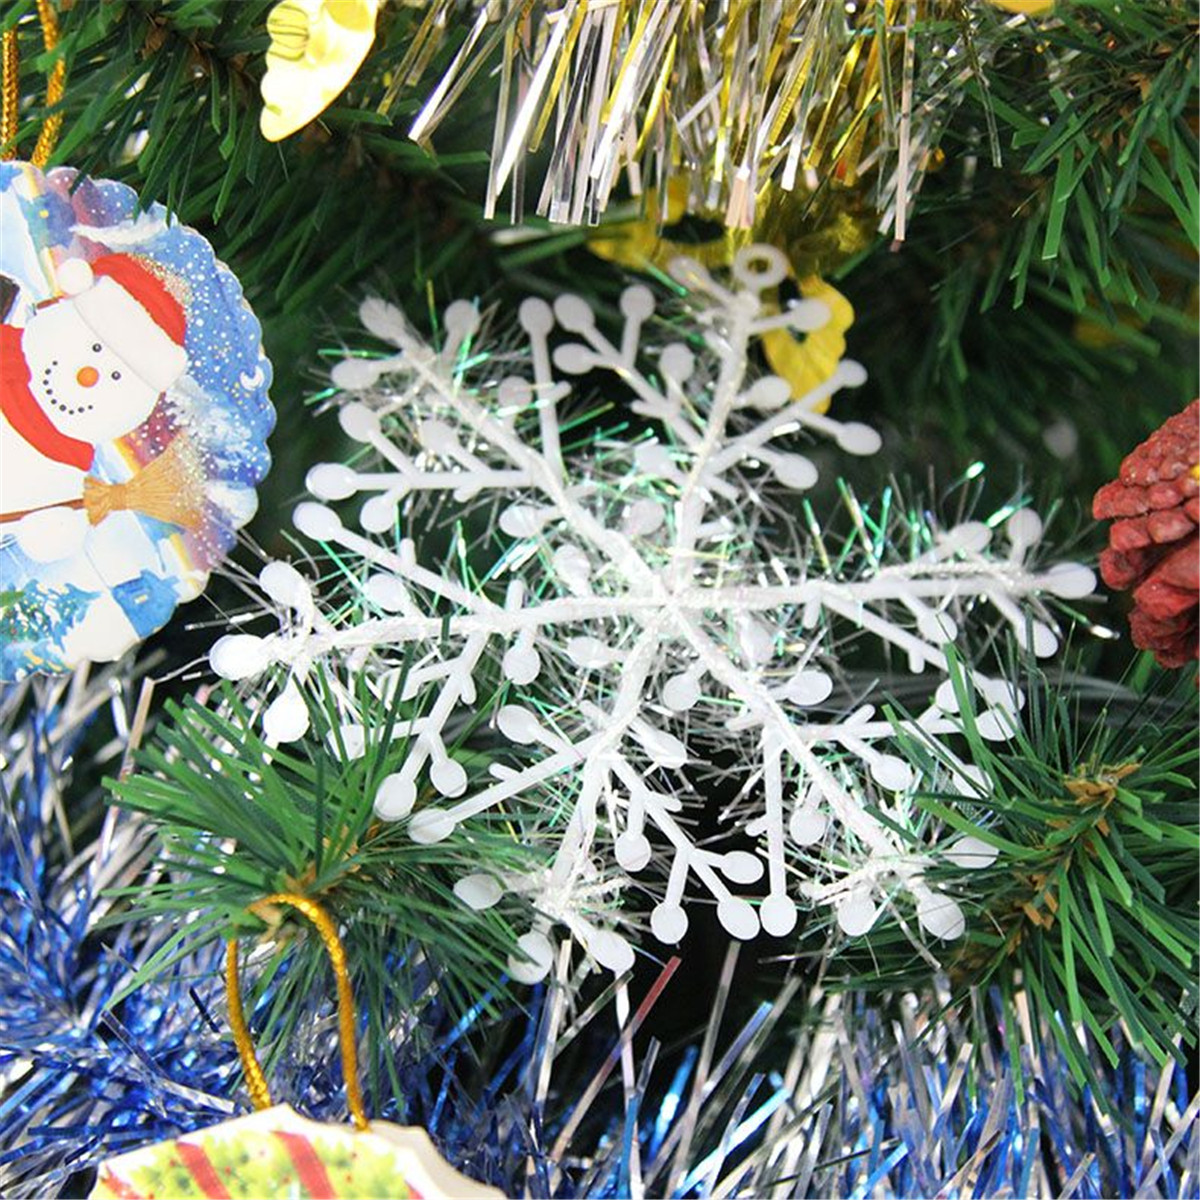 60pcs Classic White Snowflake Ornament Christmas Xmas Tree Hanging Decoration